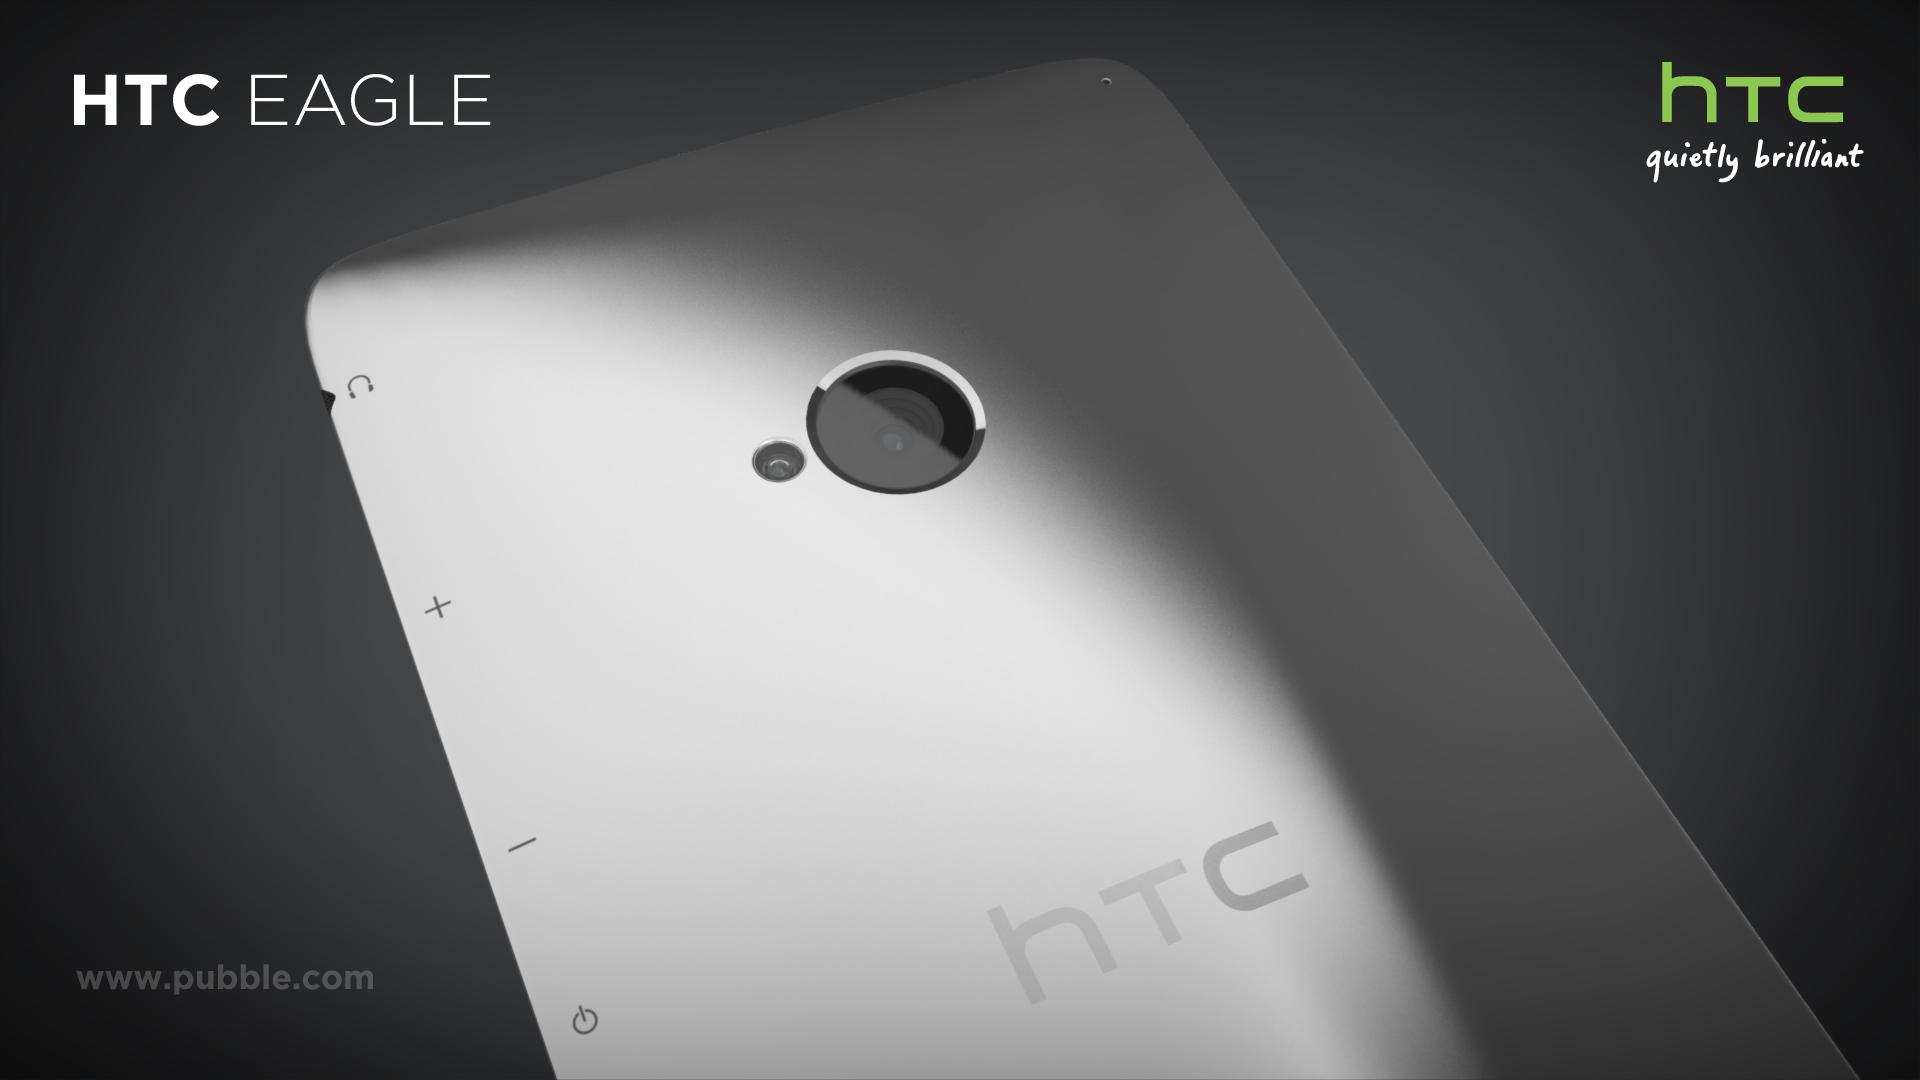 HTC Eagle - APN